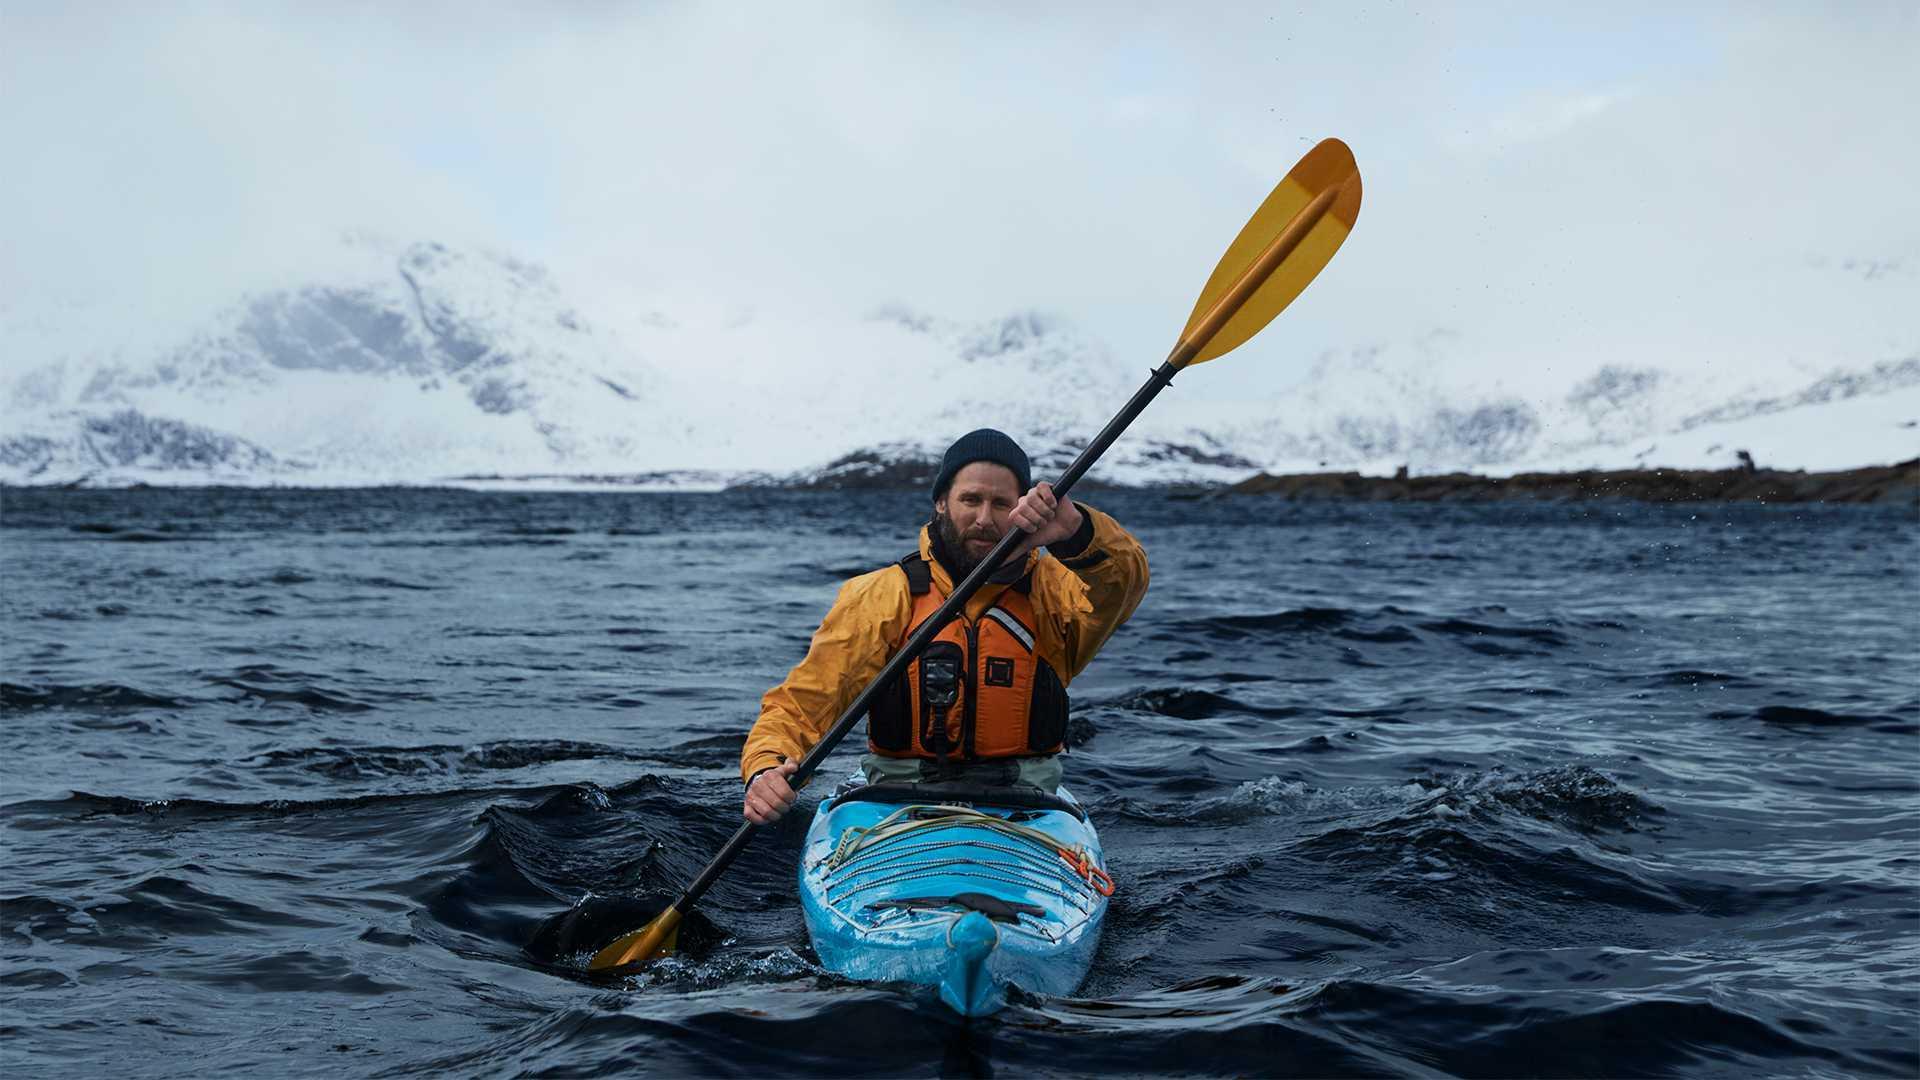 David Mayer de Rothschild explorer and environmentalist interview